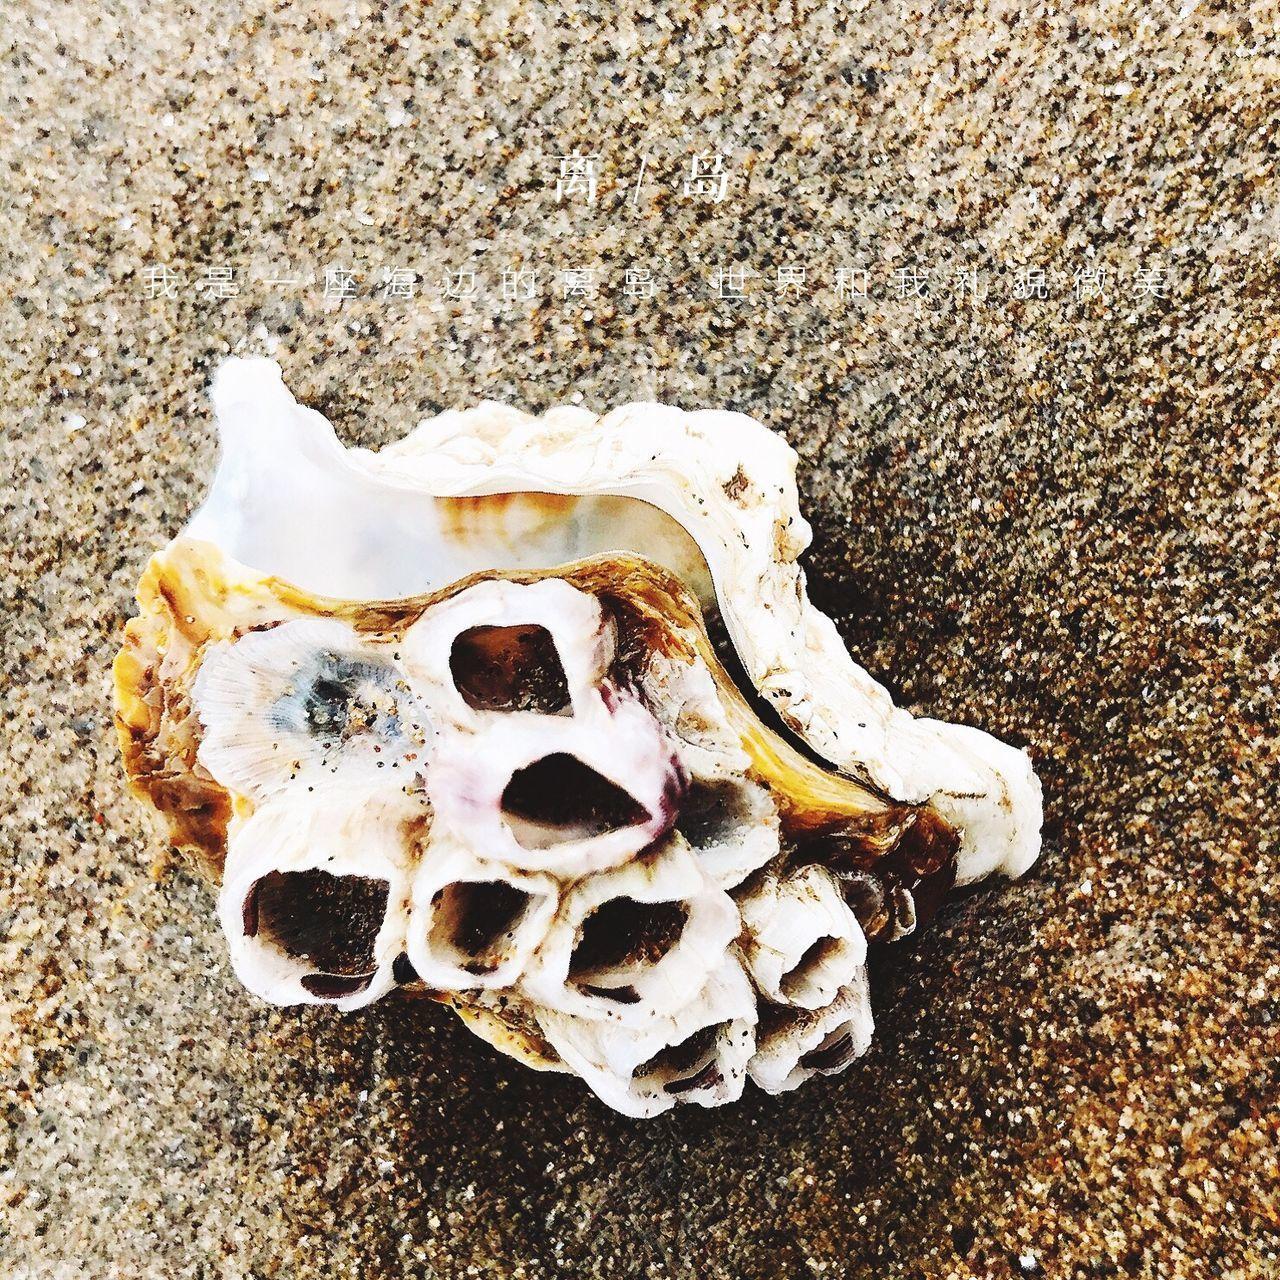 no people, close-up, day, animal bone, outdoors, beach, nature, rotting, animal themes